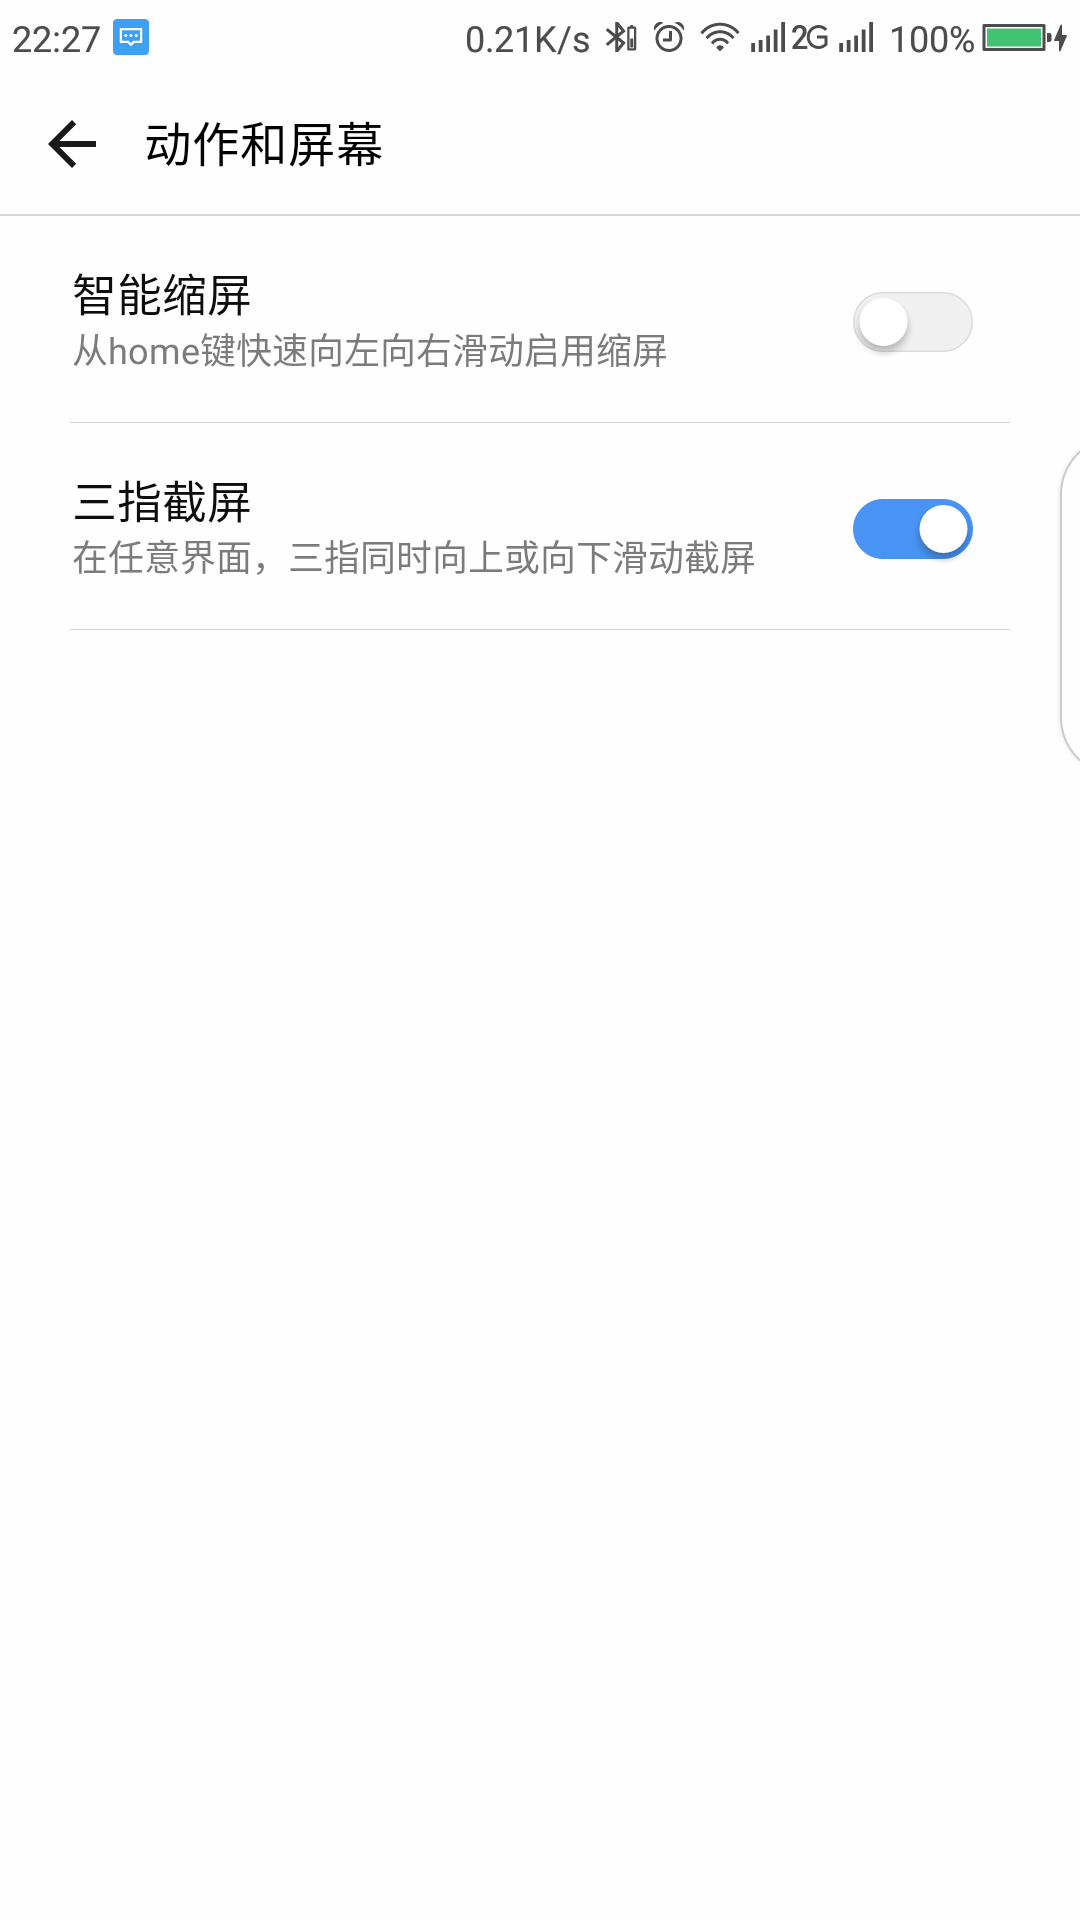 Screenshot_2019-01-02-22-27-57.png